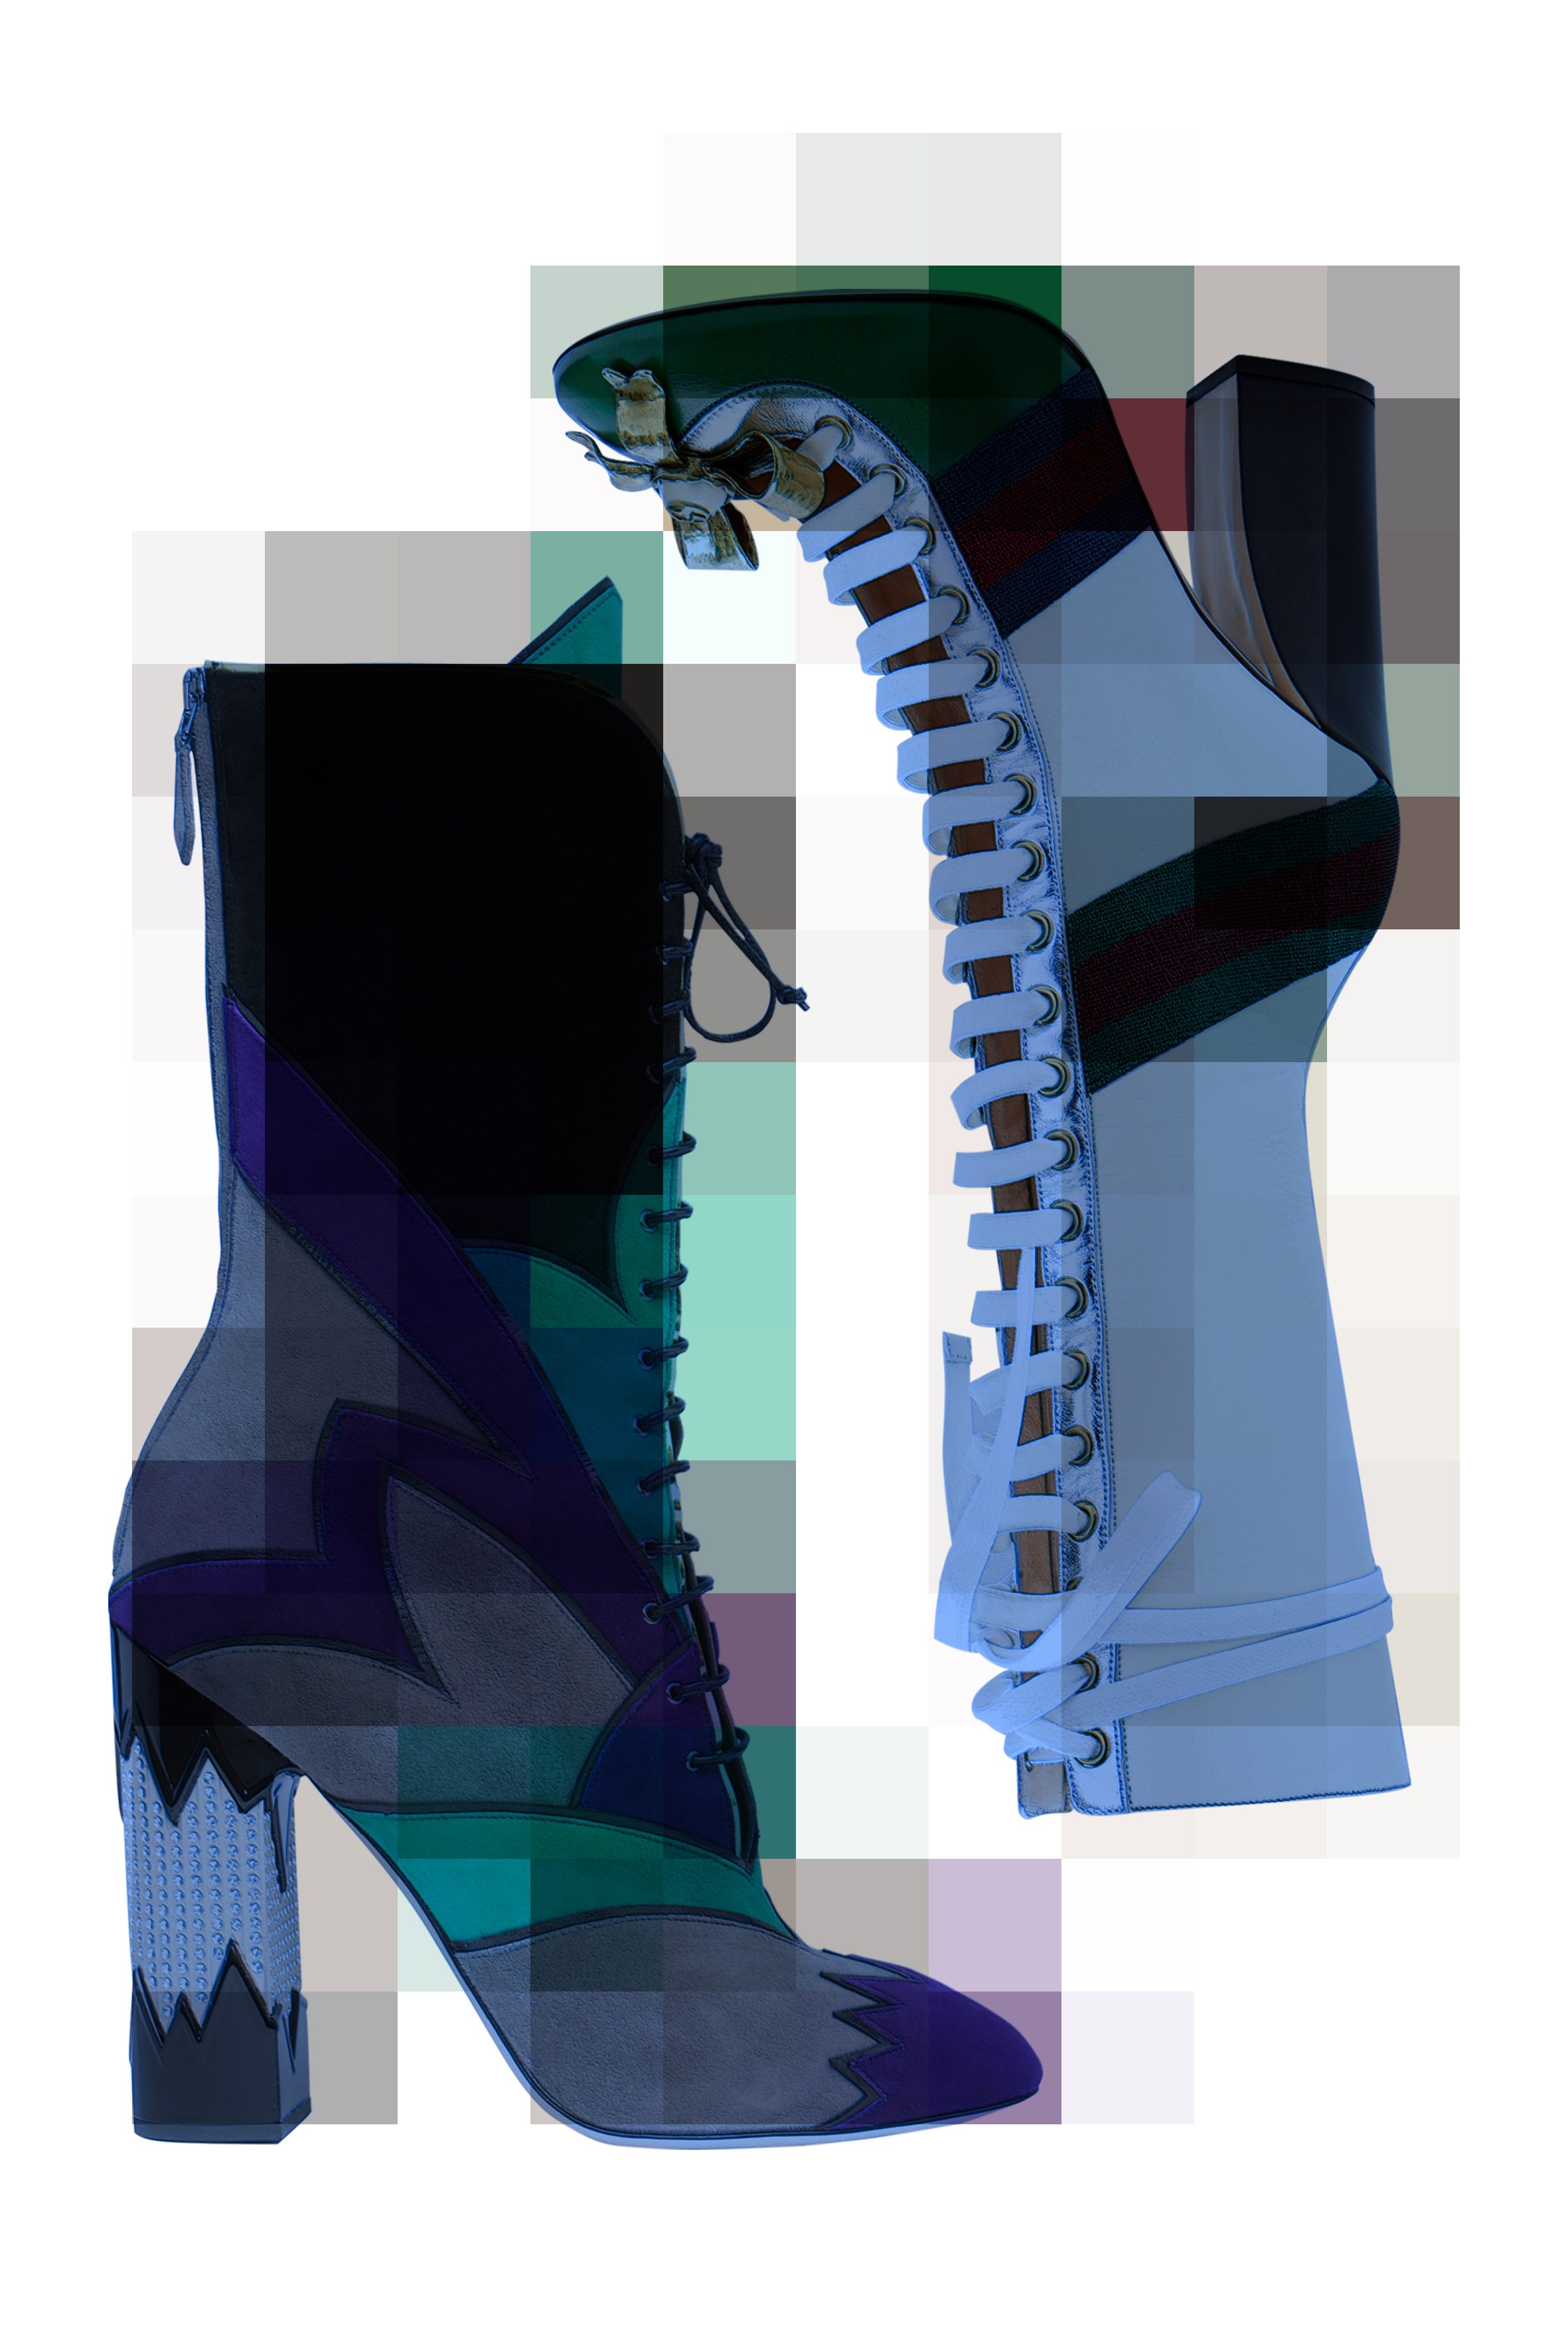 Miu Miu and Gucci's laced boots